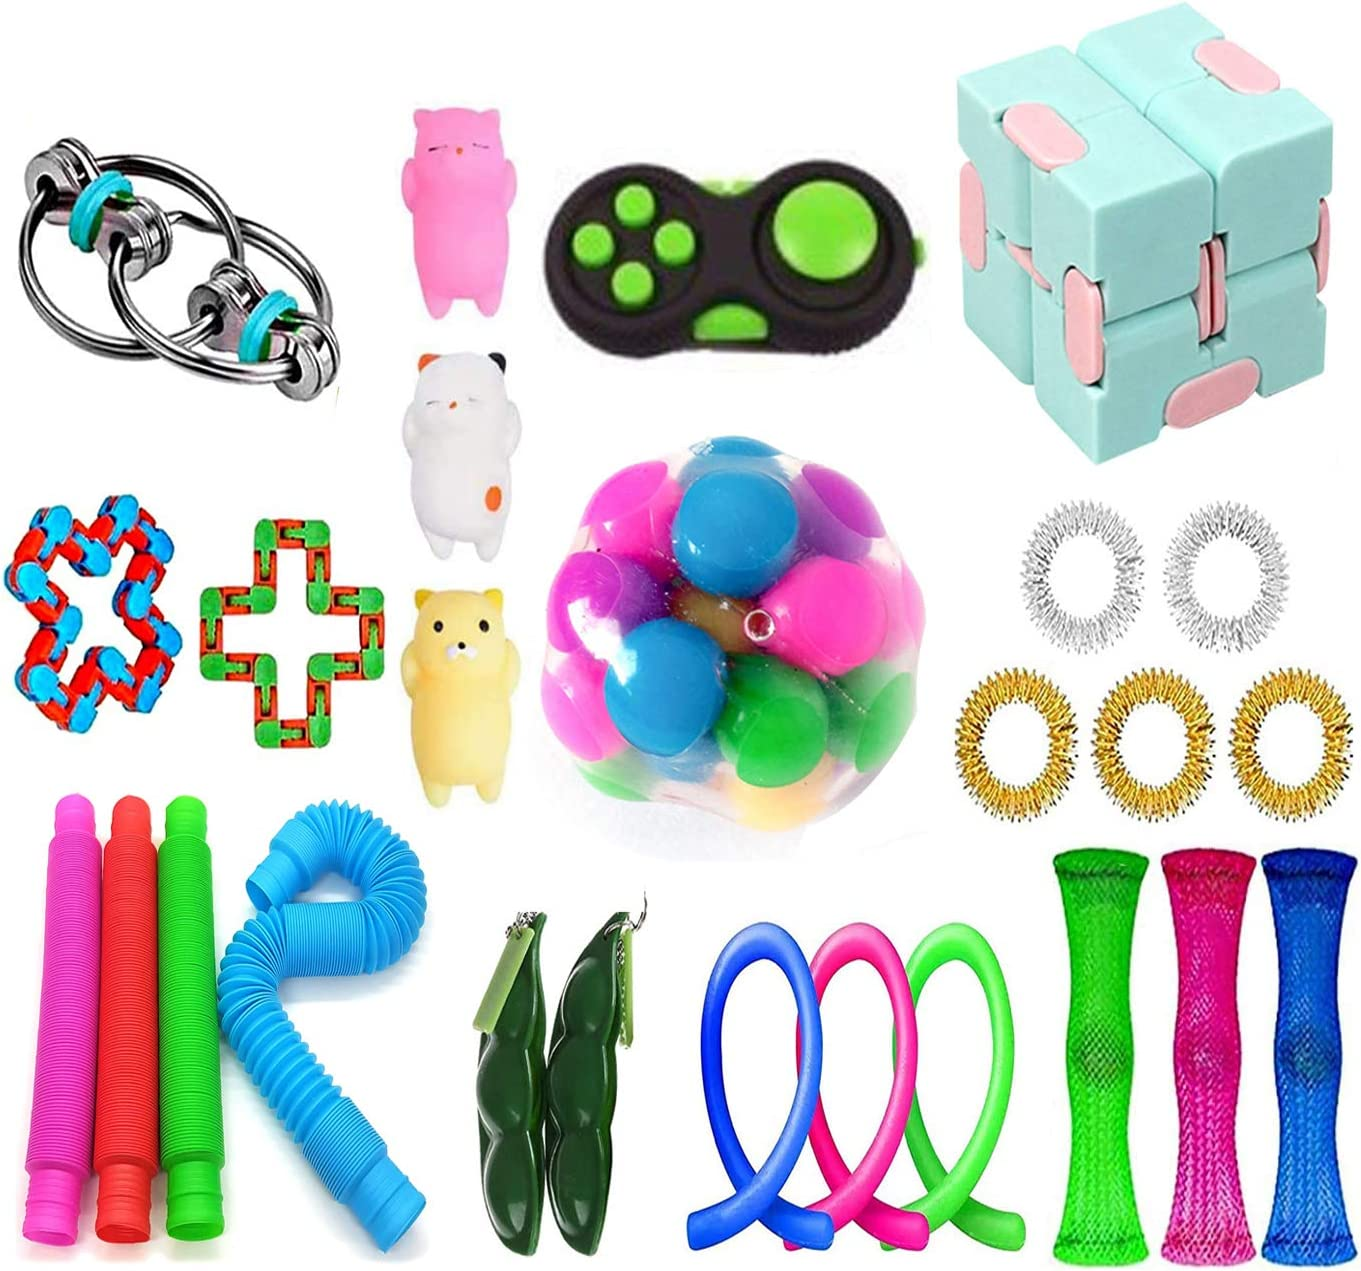 Slingshot Chicken mesh and Marble Fidget Include Simple Dimple Fidget Toy bilkoivn 14pcs Cheap Fidget Toy Pack